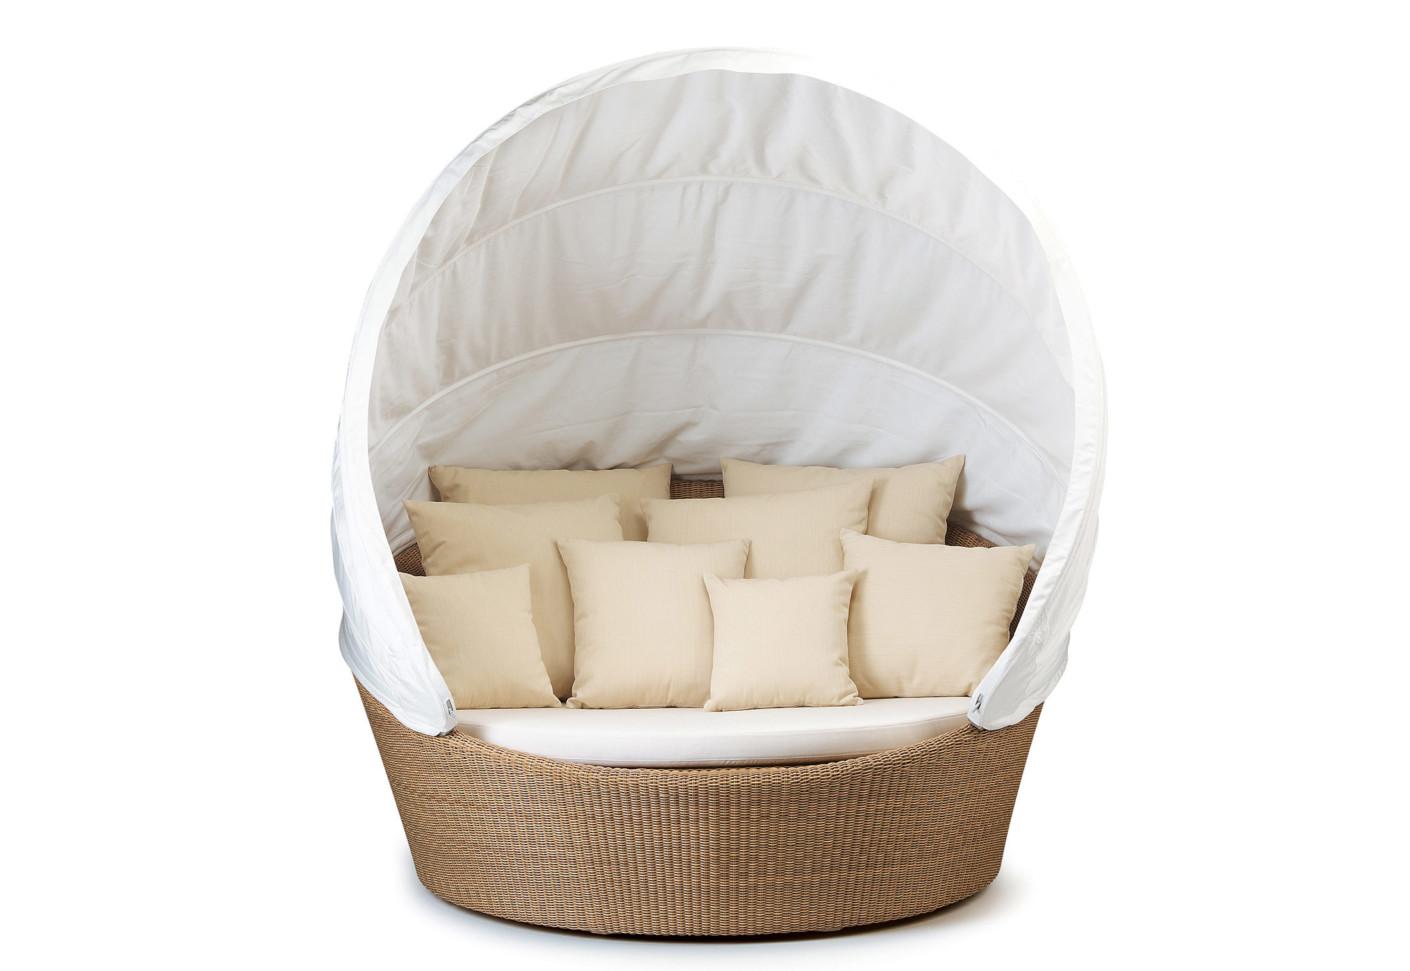 orbit loveseat incl canopy by dedon stylepark. Black Bedroom Furniture Sets. Home Design Ideas